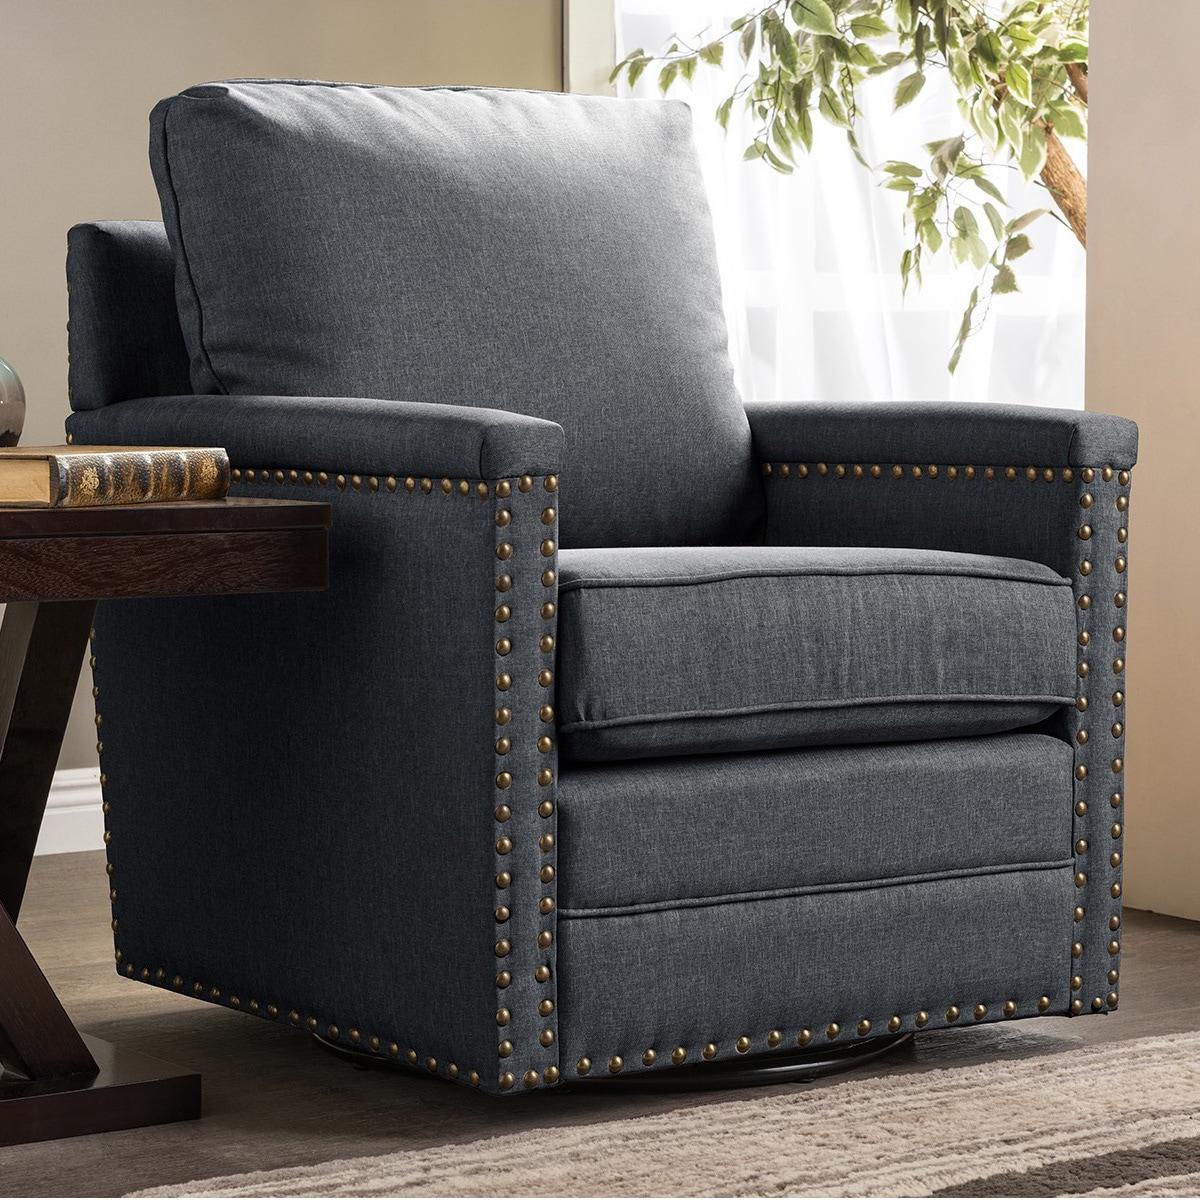 Baxton Studio Ashley Contemporary Grey Fabric Upholstered...